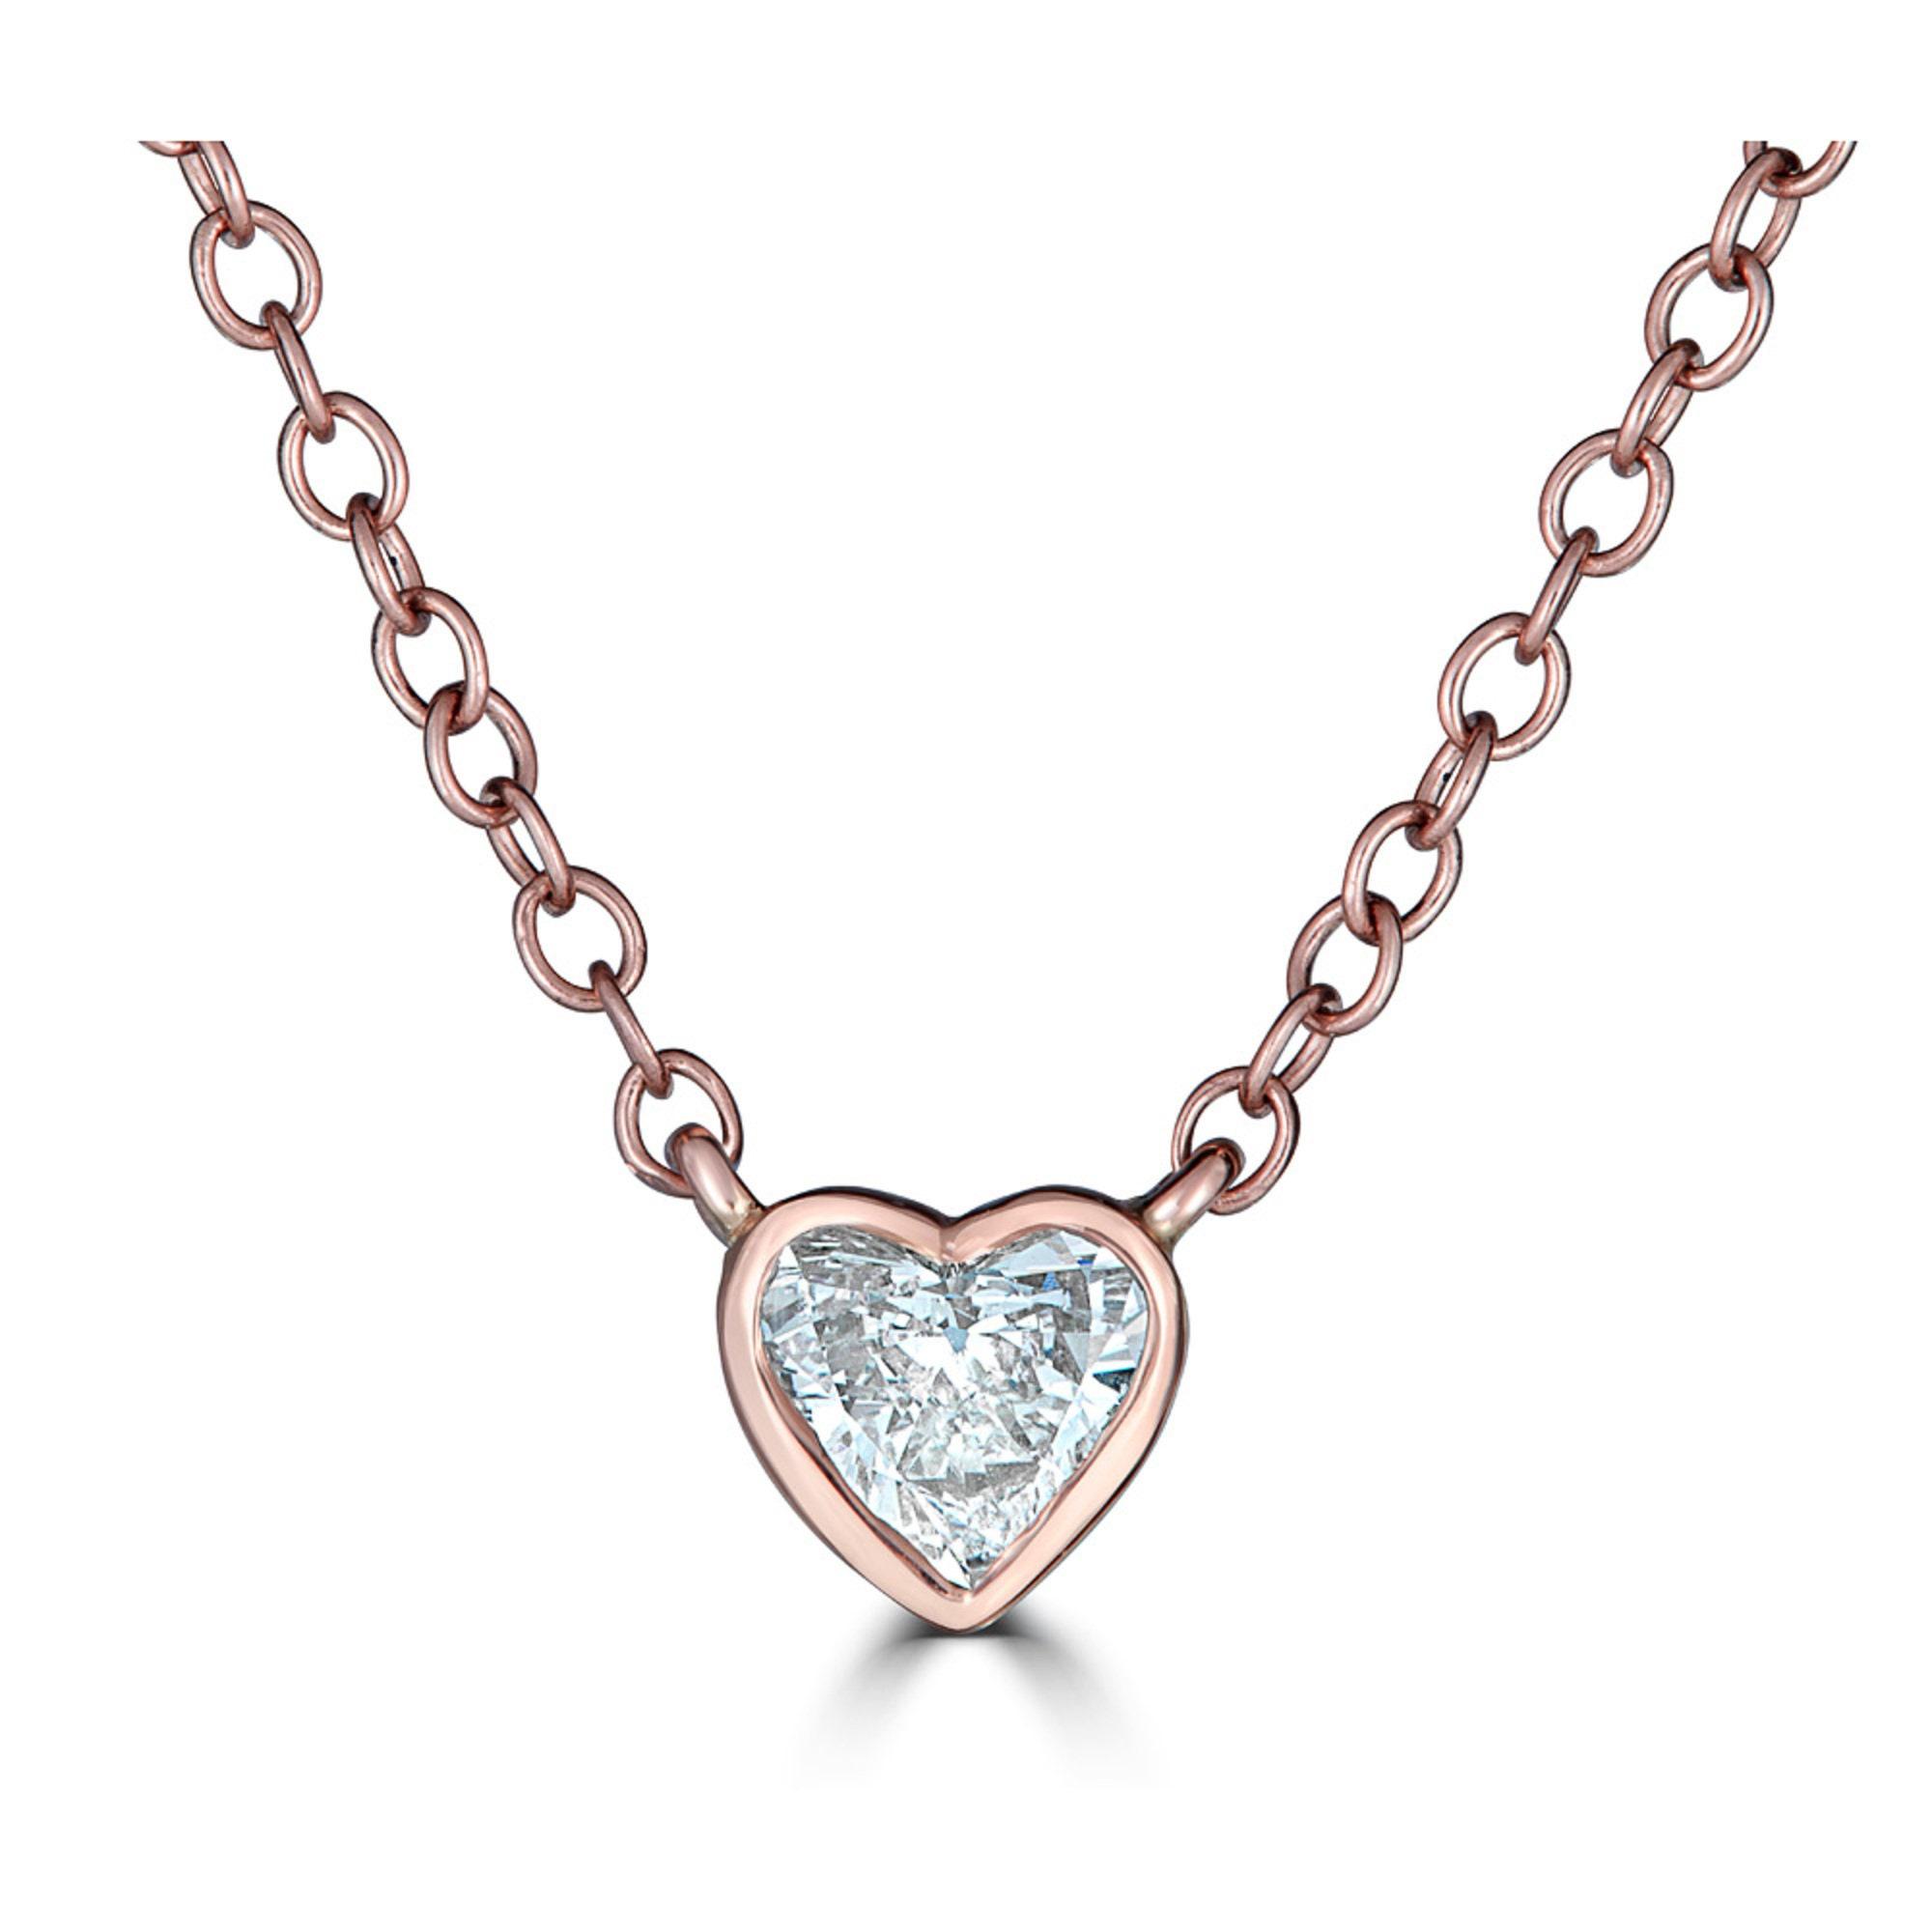 NEW Beautiful 925P Silver Rope Bracelet UK Seller